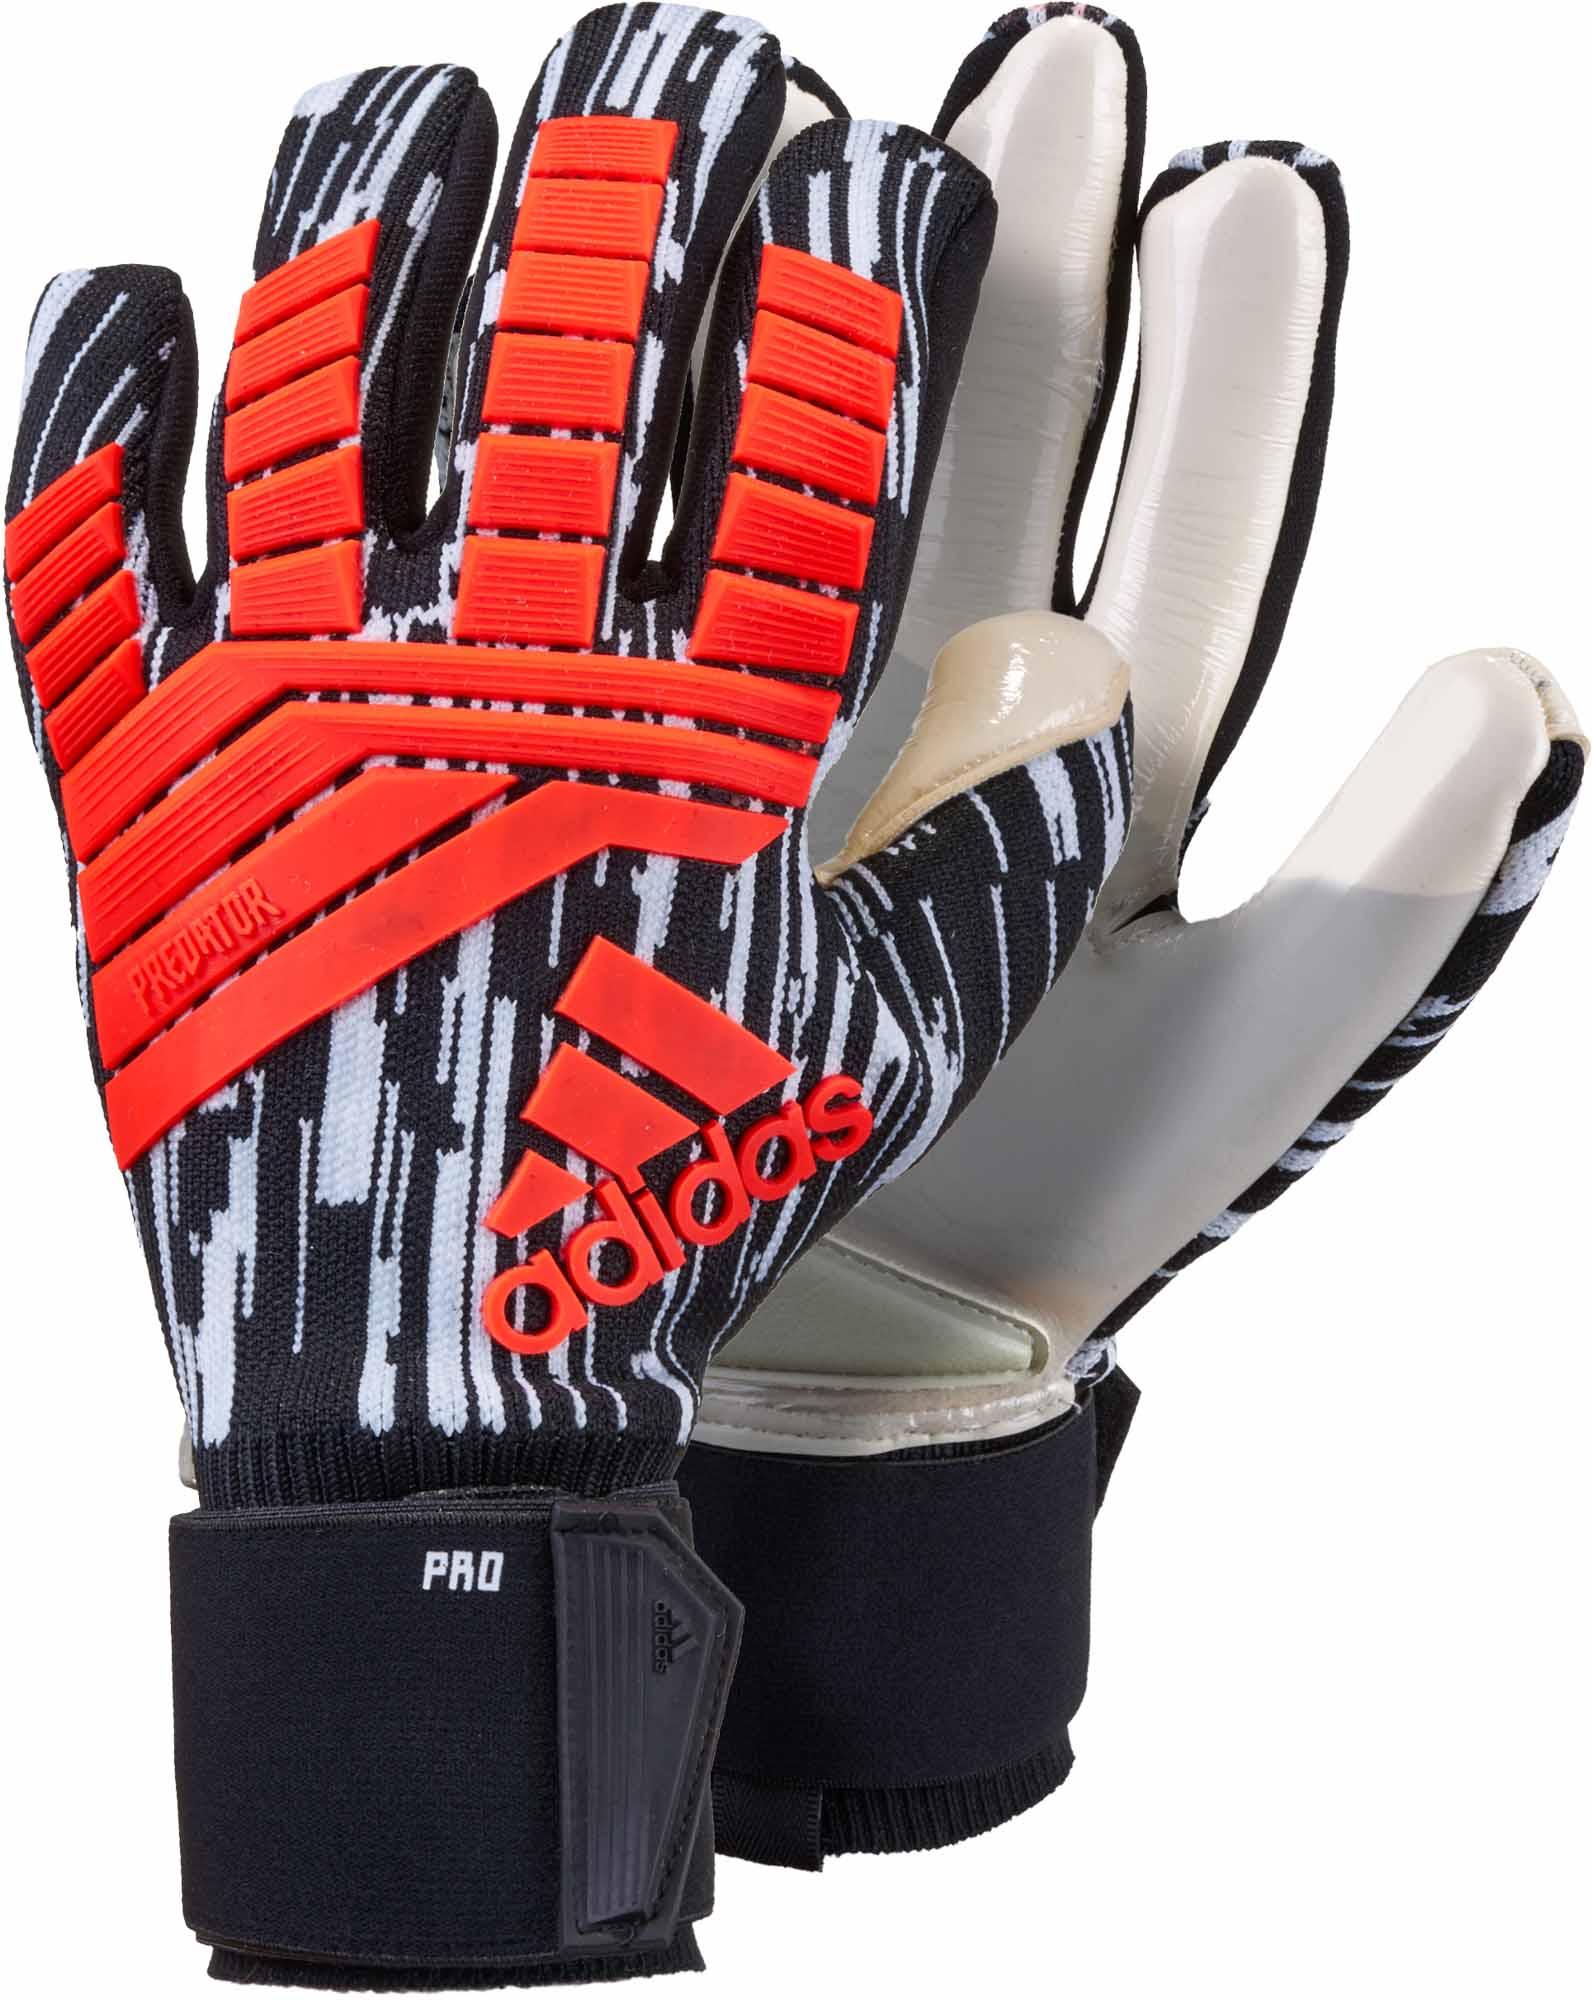 55d4582ea8fa adidas Predator Pro Goalkeeper Gloves – Manuel Neuer – Solar Red   Black